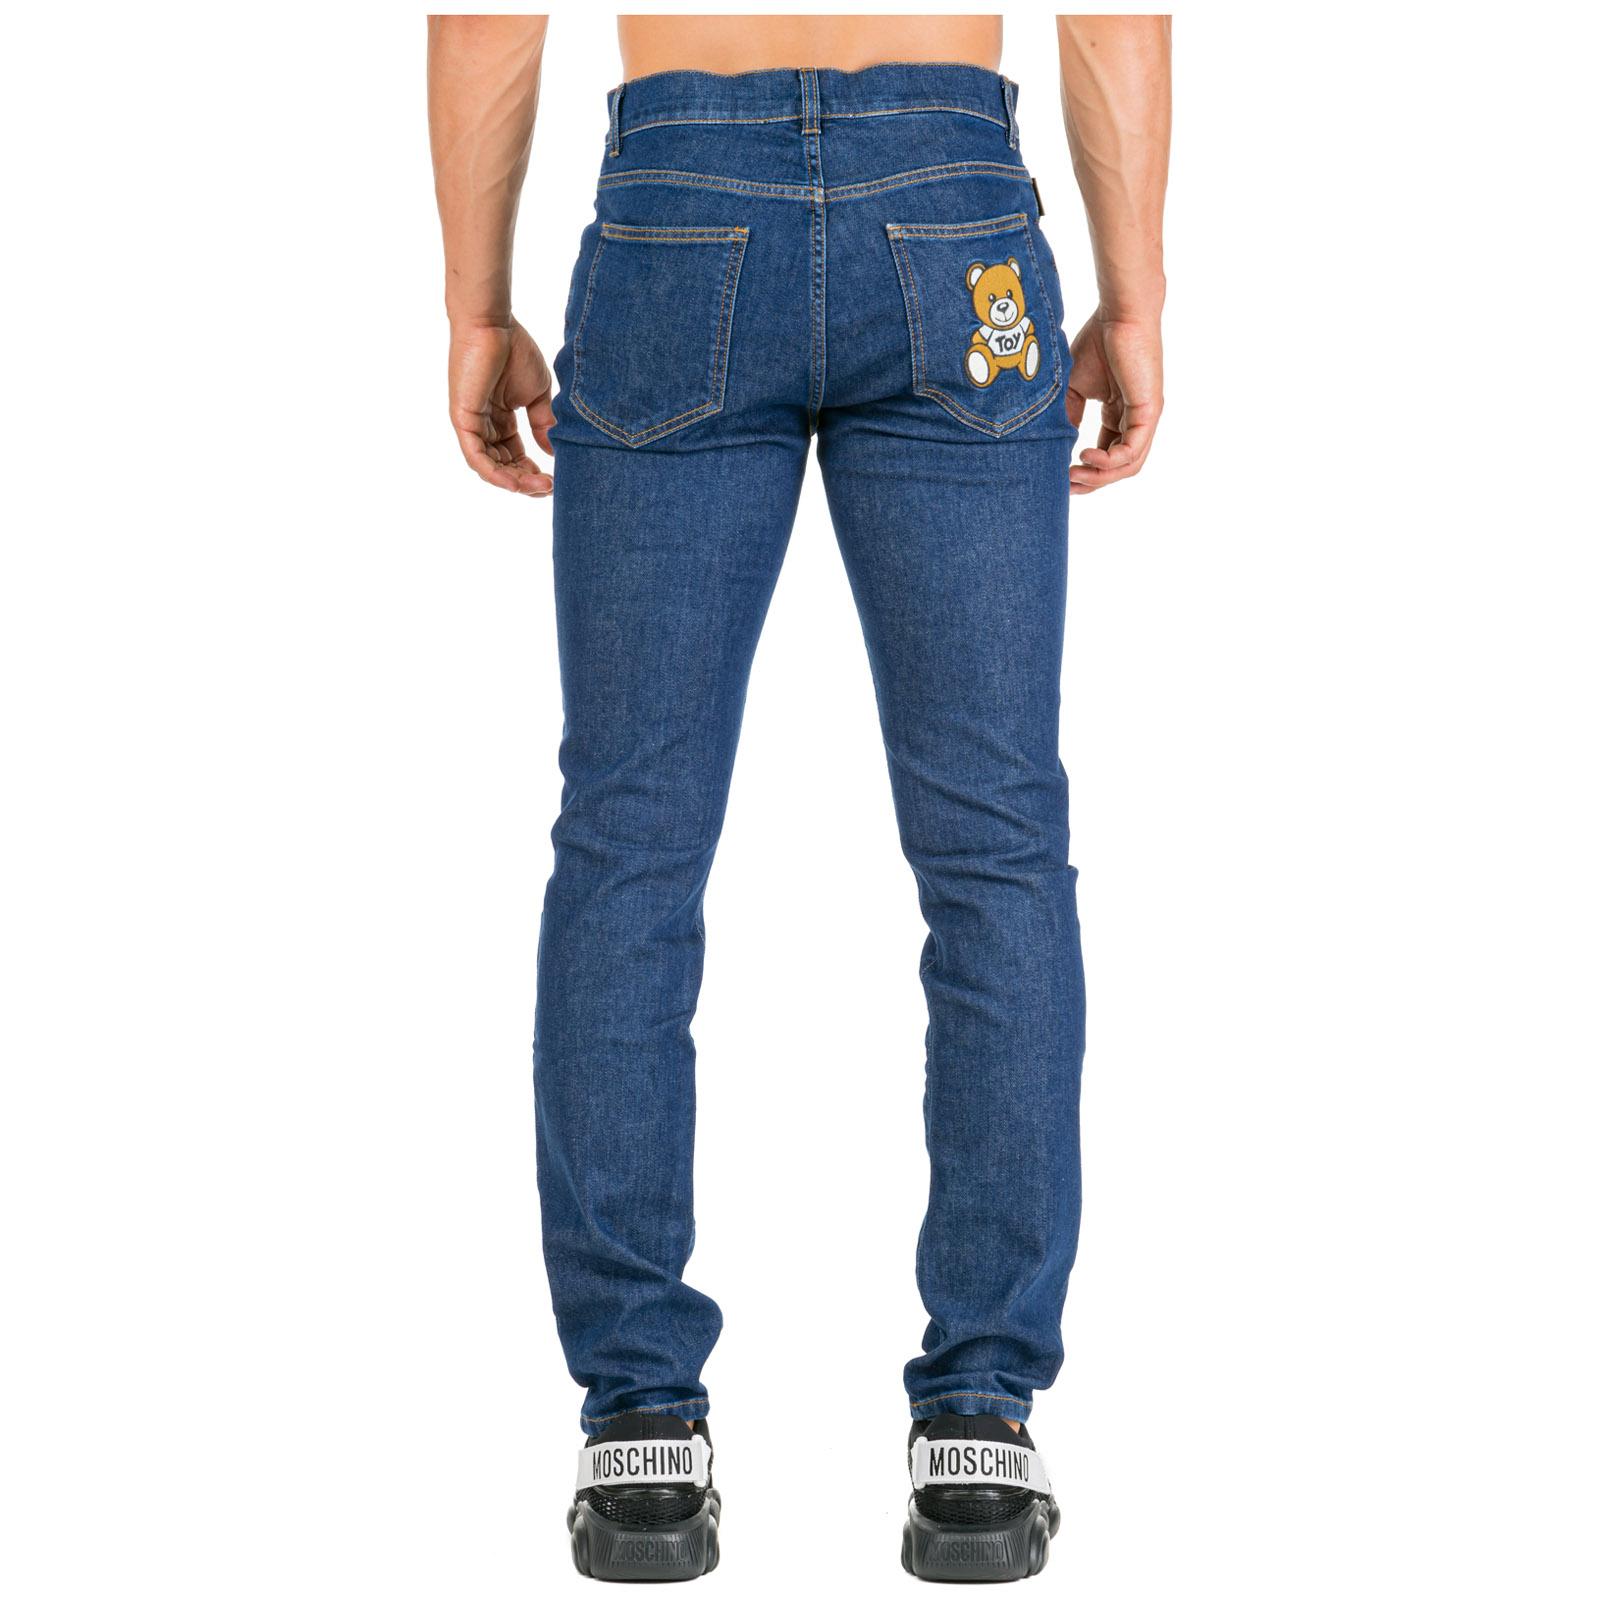 609fad5448 Jeans uomo teddy bear slim fit